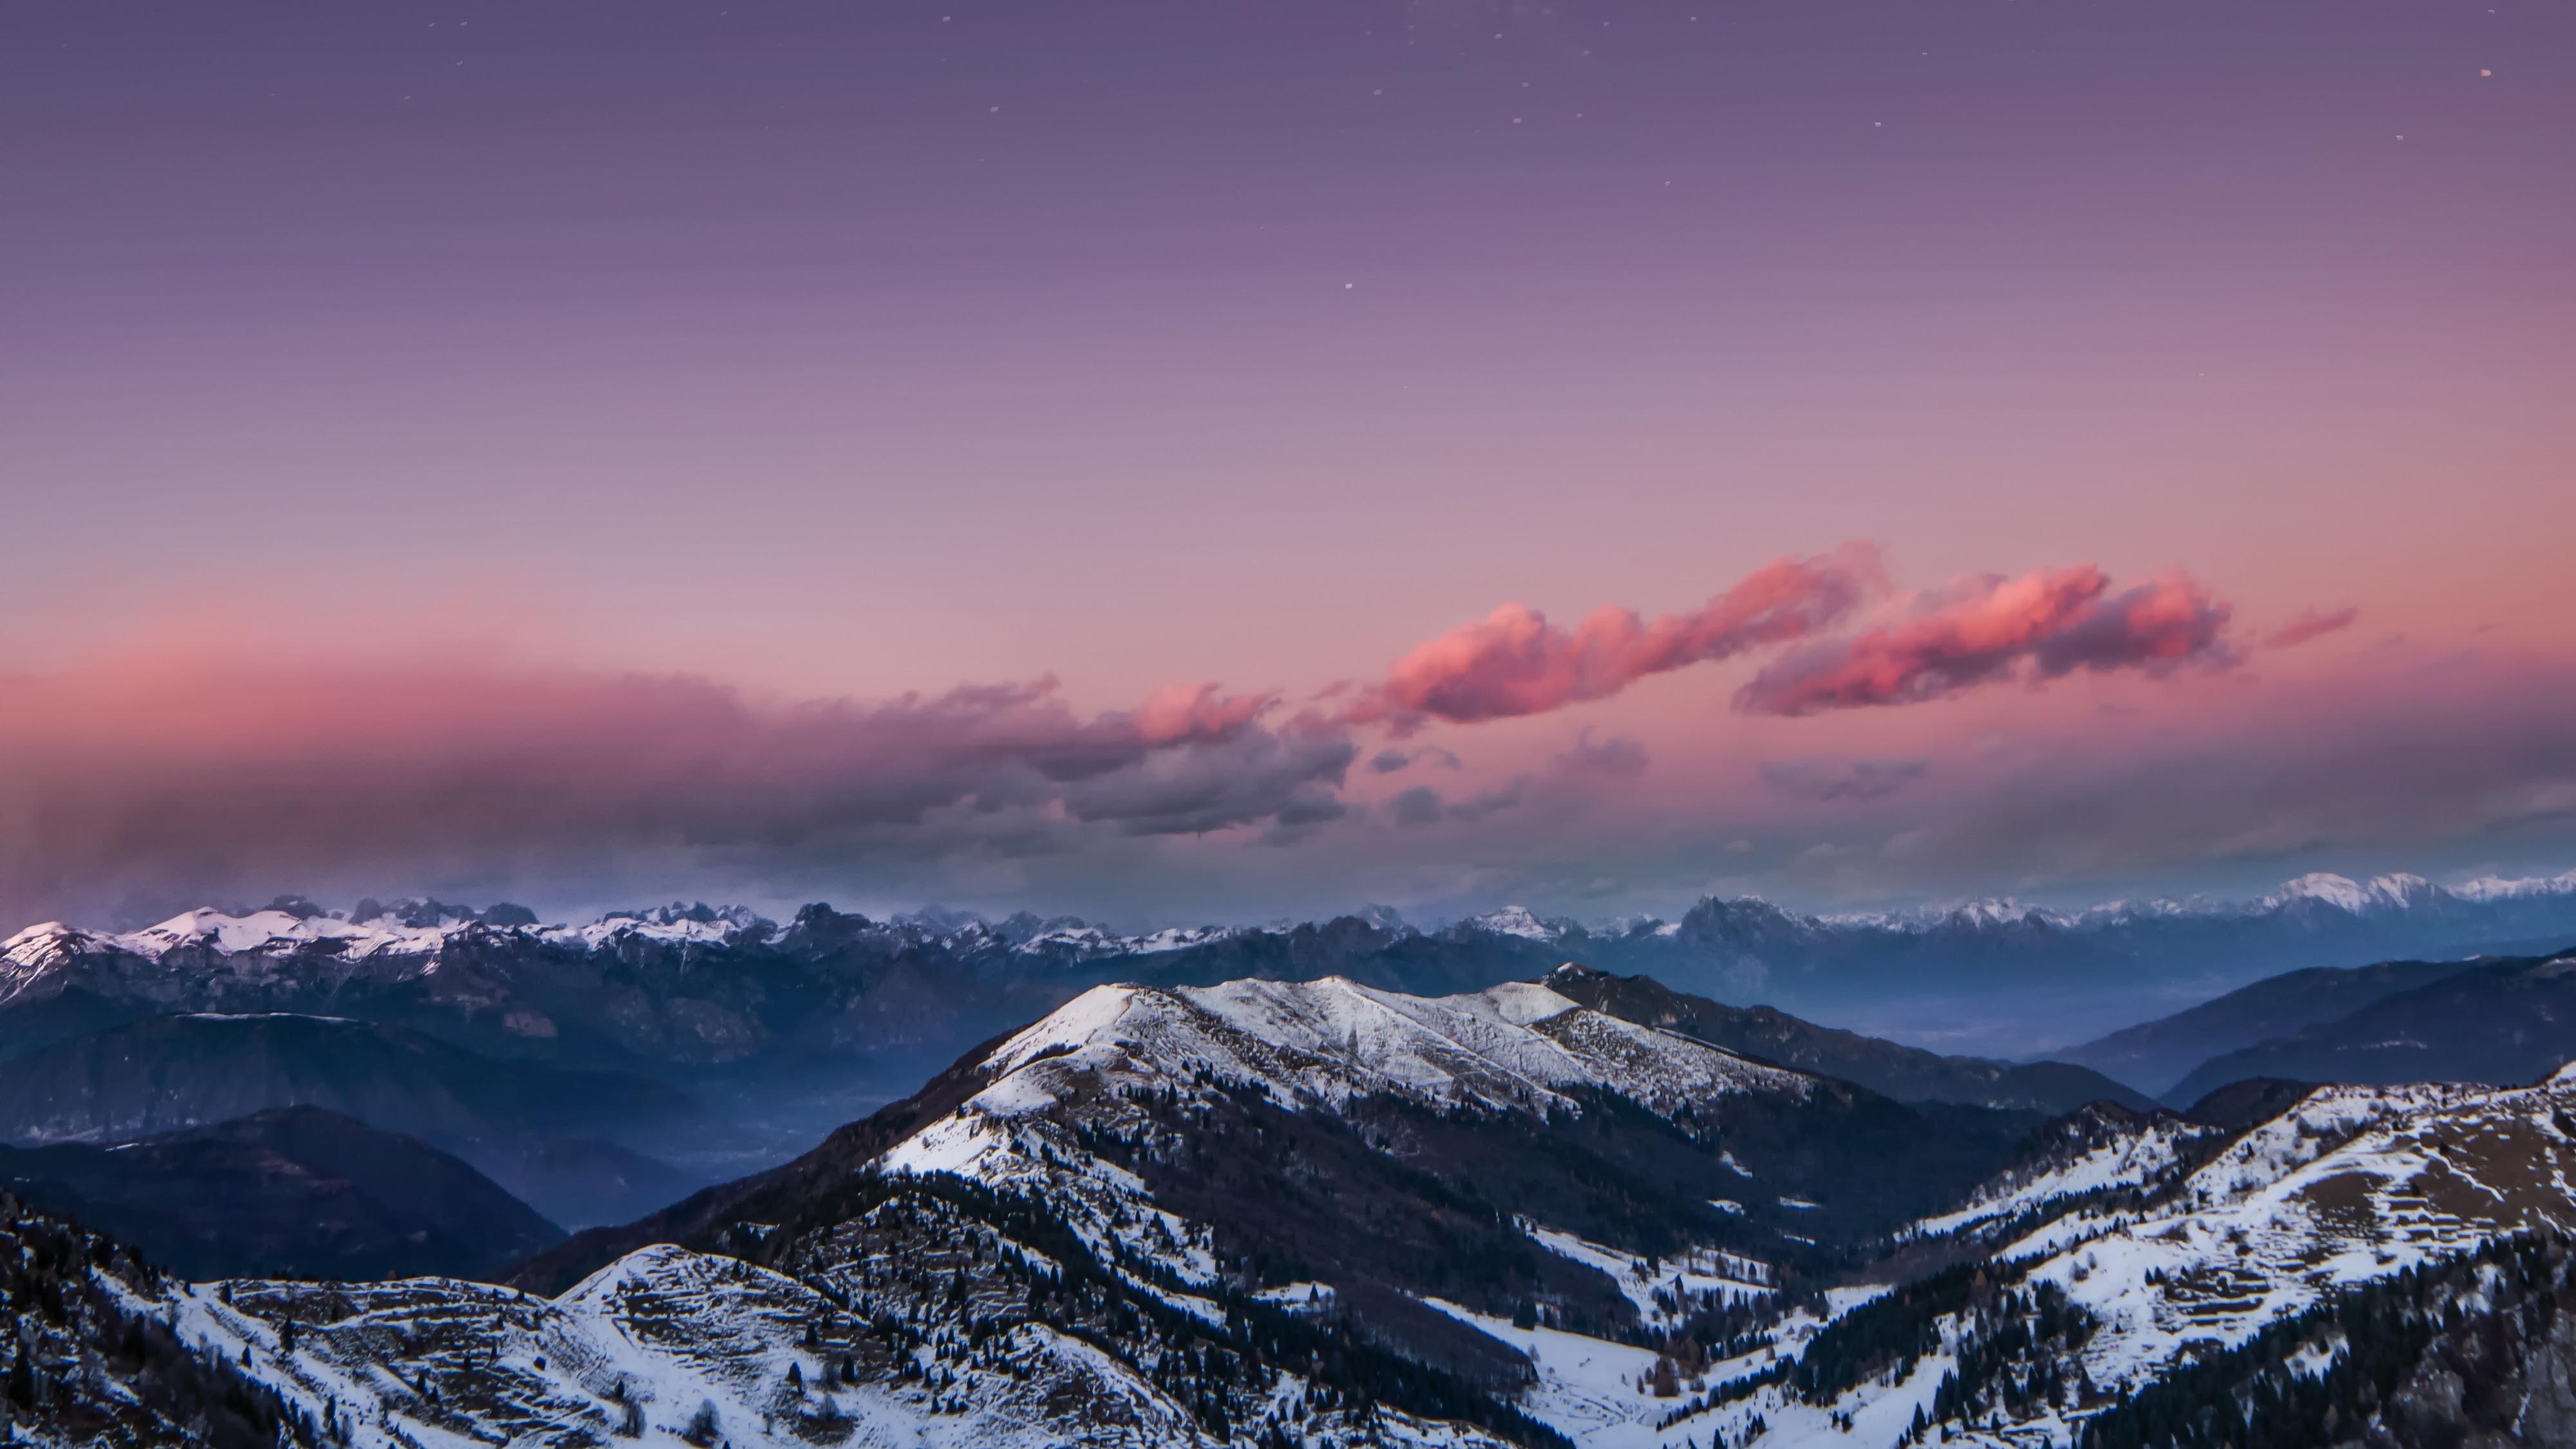 Mountains starry sky night snow dolomites italy 4k hd - Night mountain wallpaper 4k ...